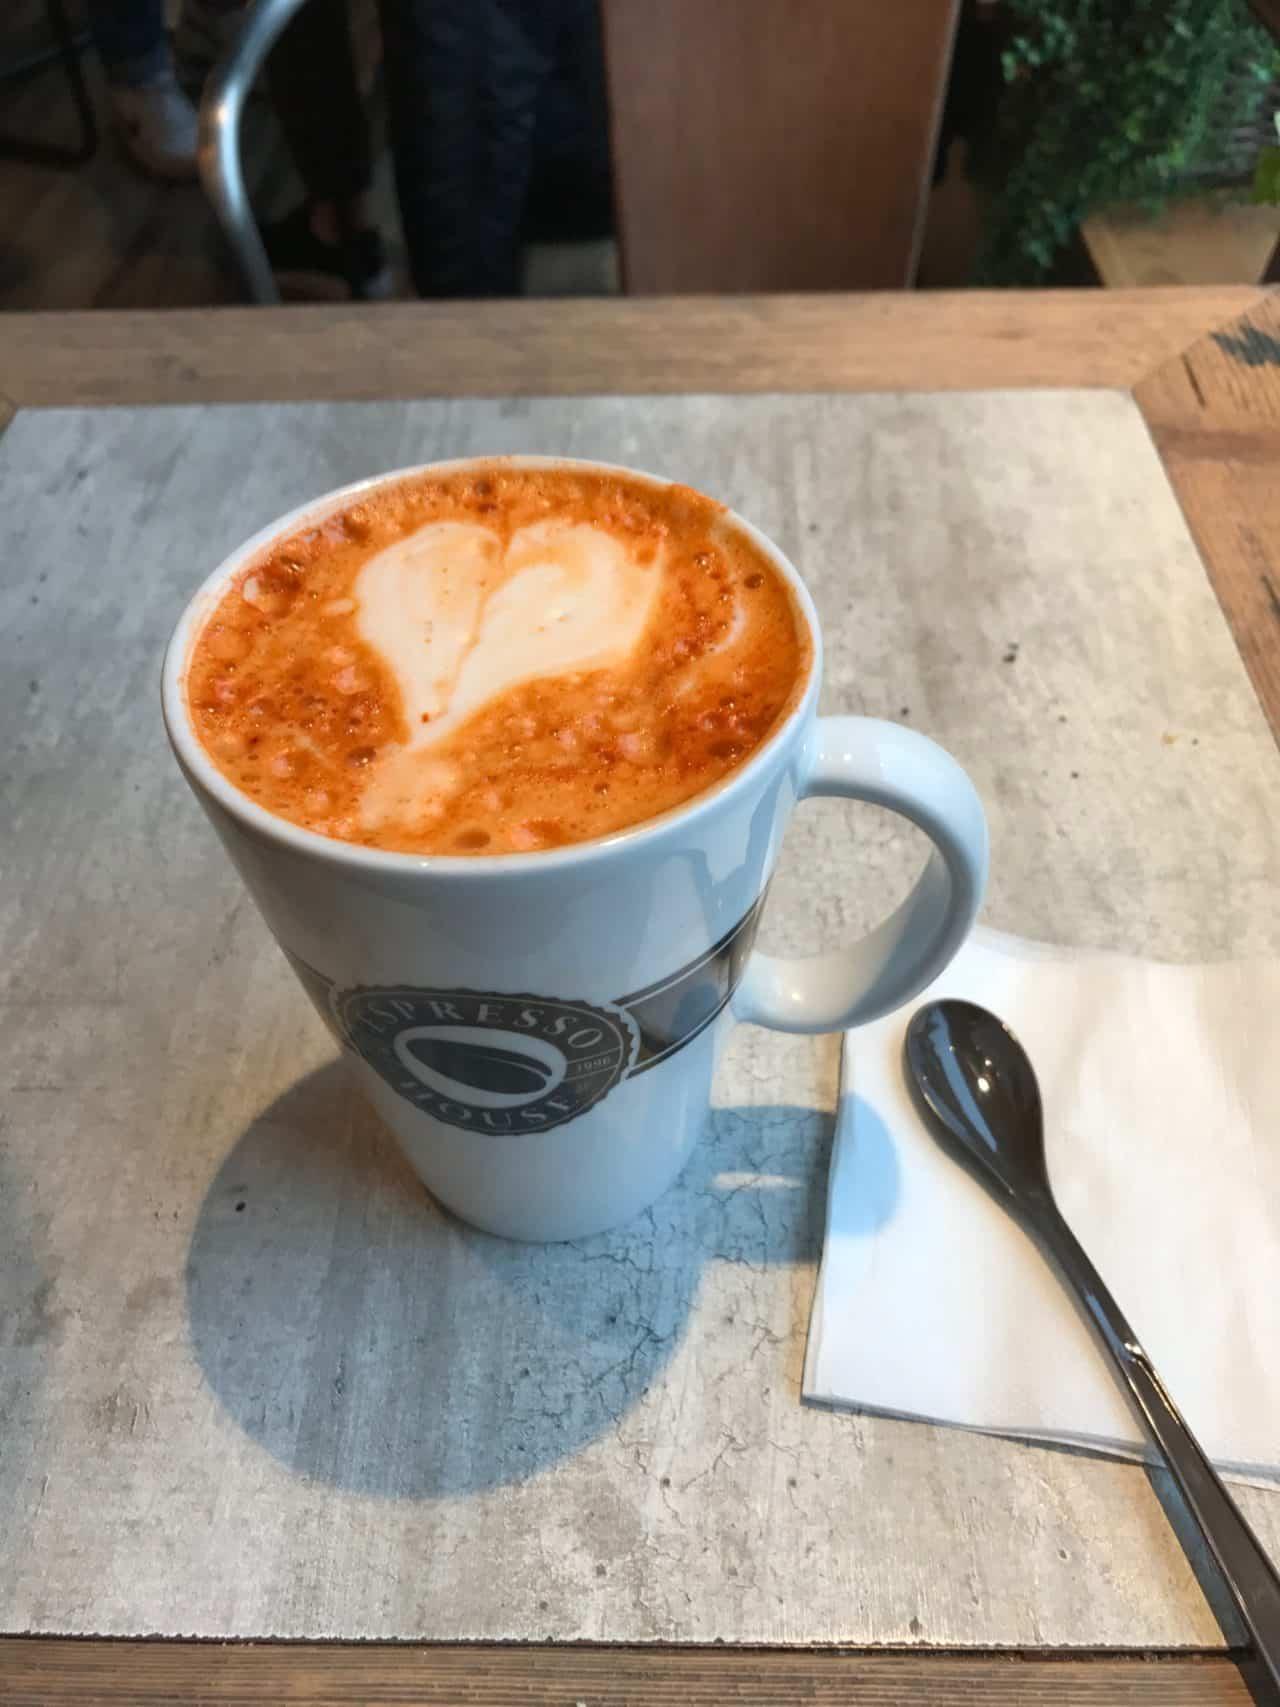 Coffee Latte In A Mug With A Heart In The Foam